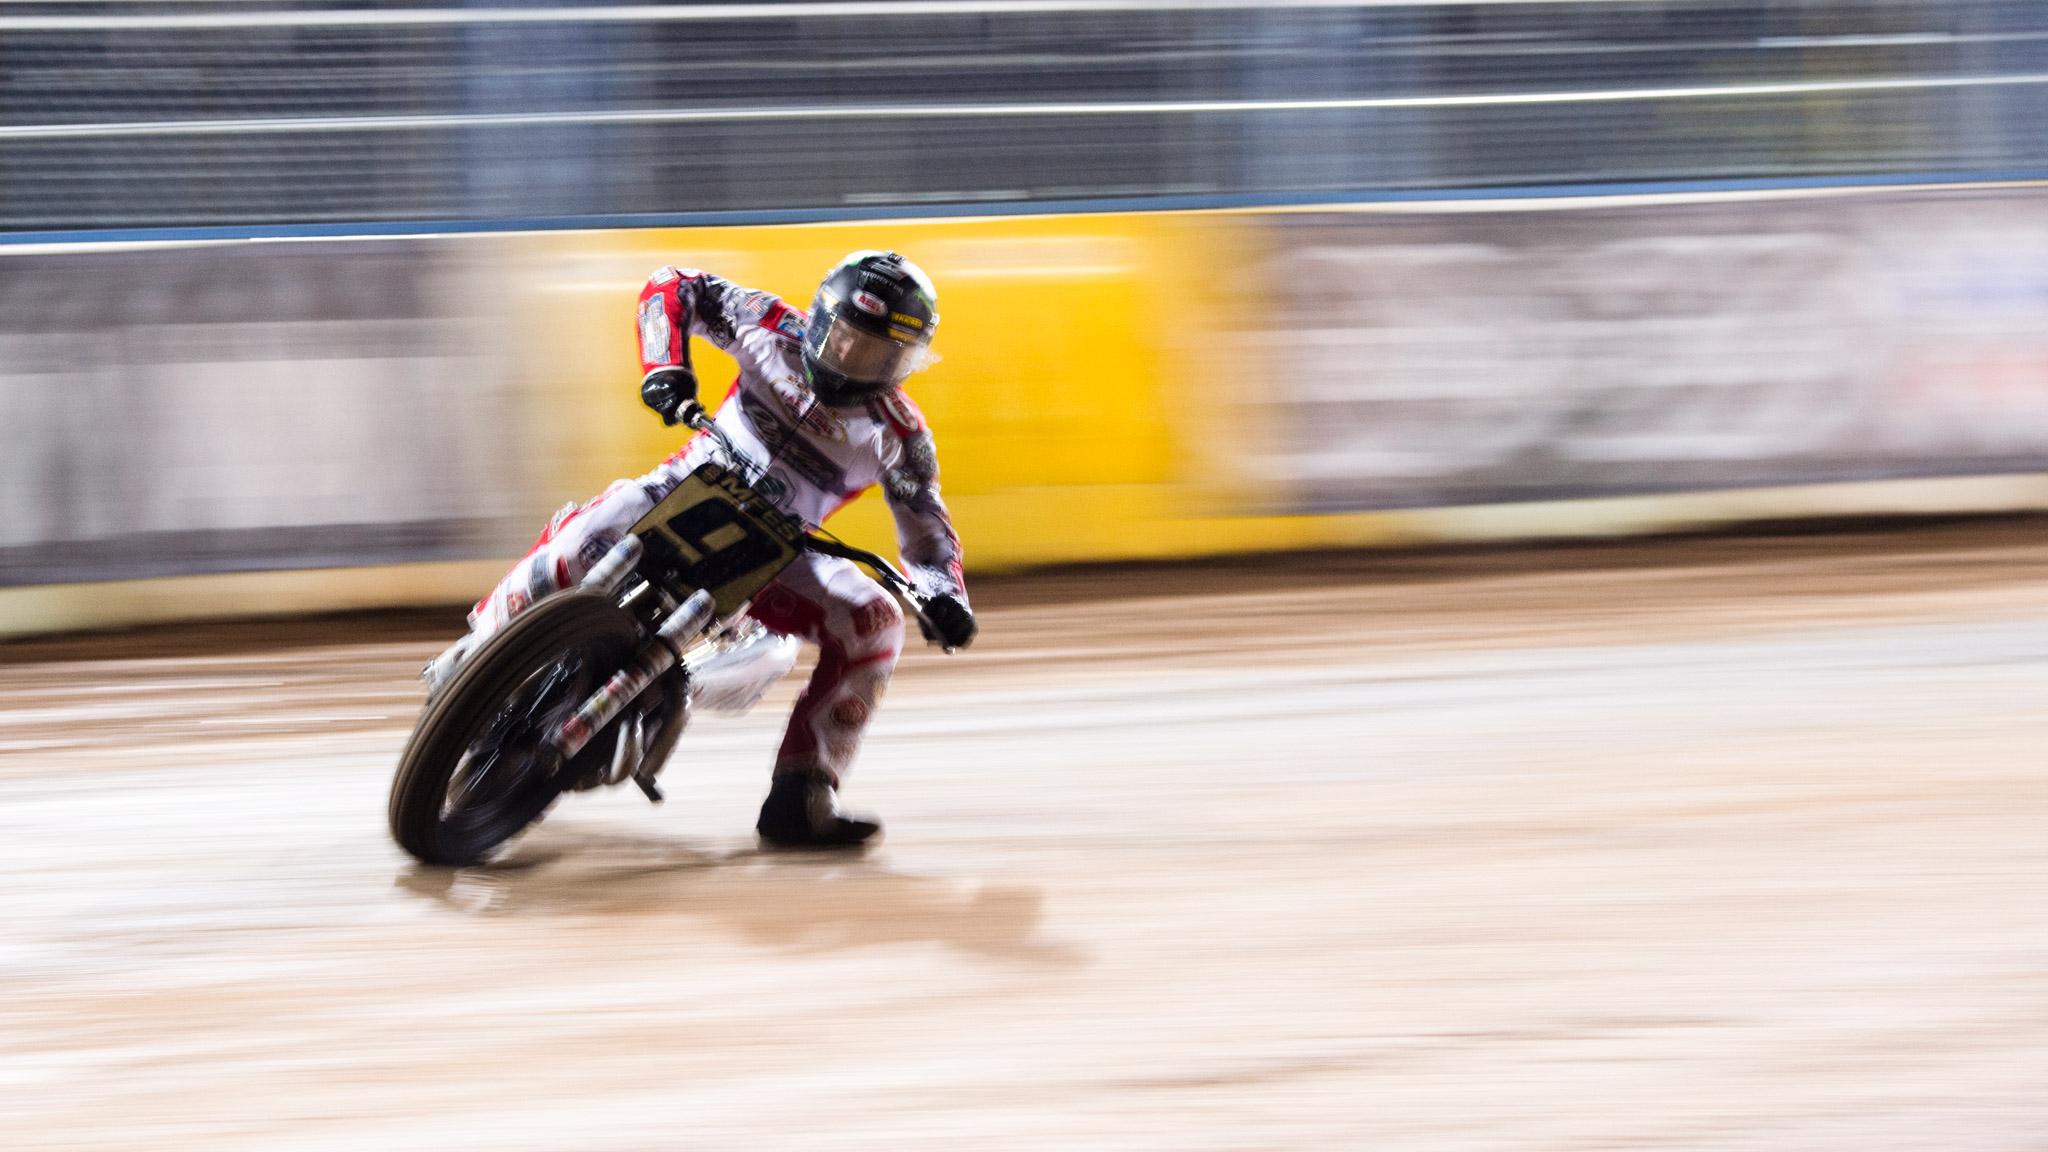 Jared Mees: Moto X Flat Track